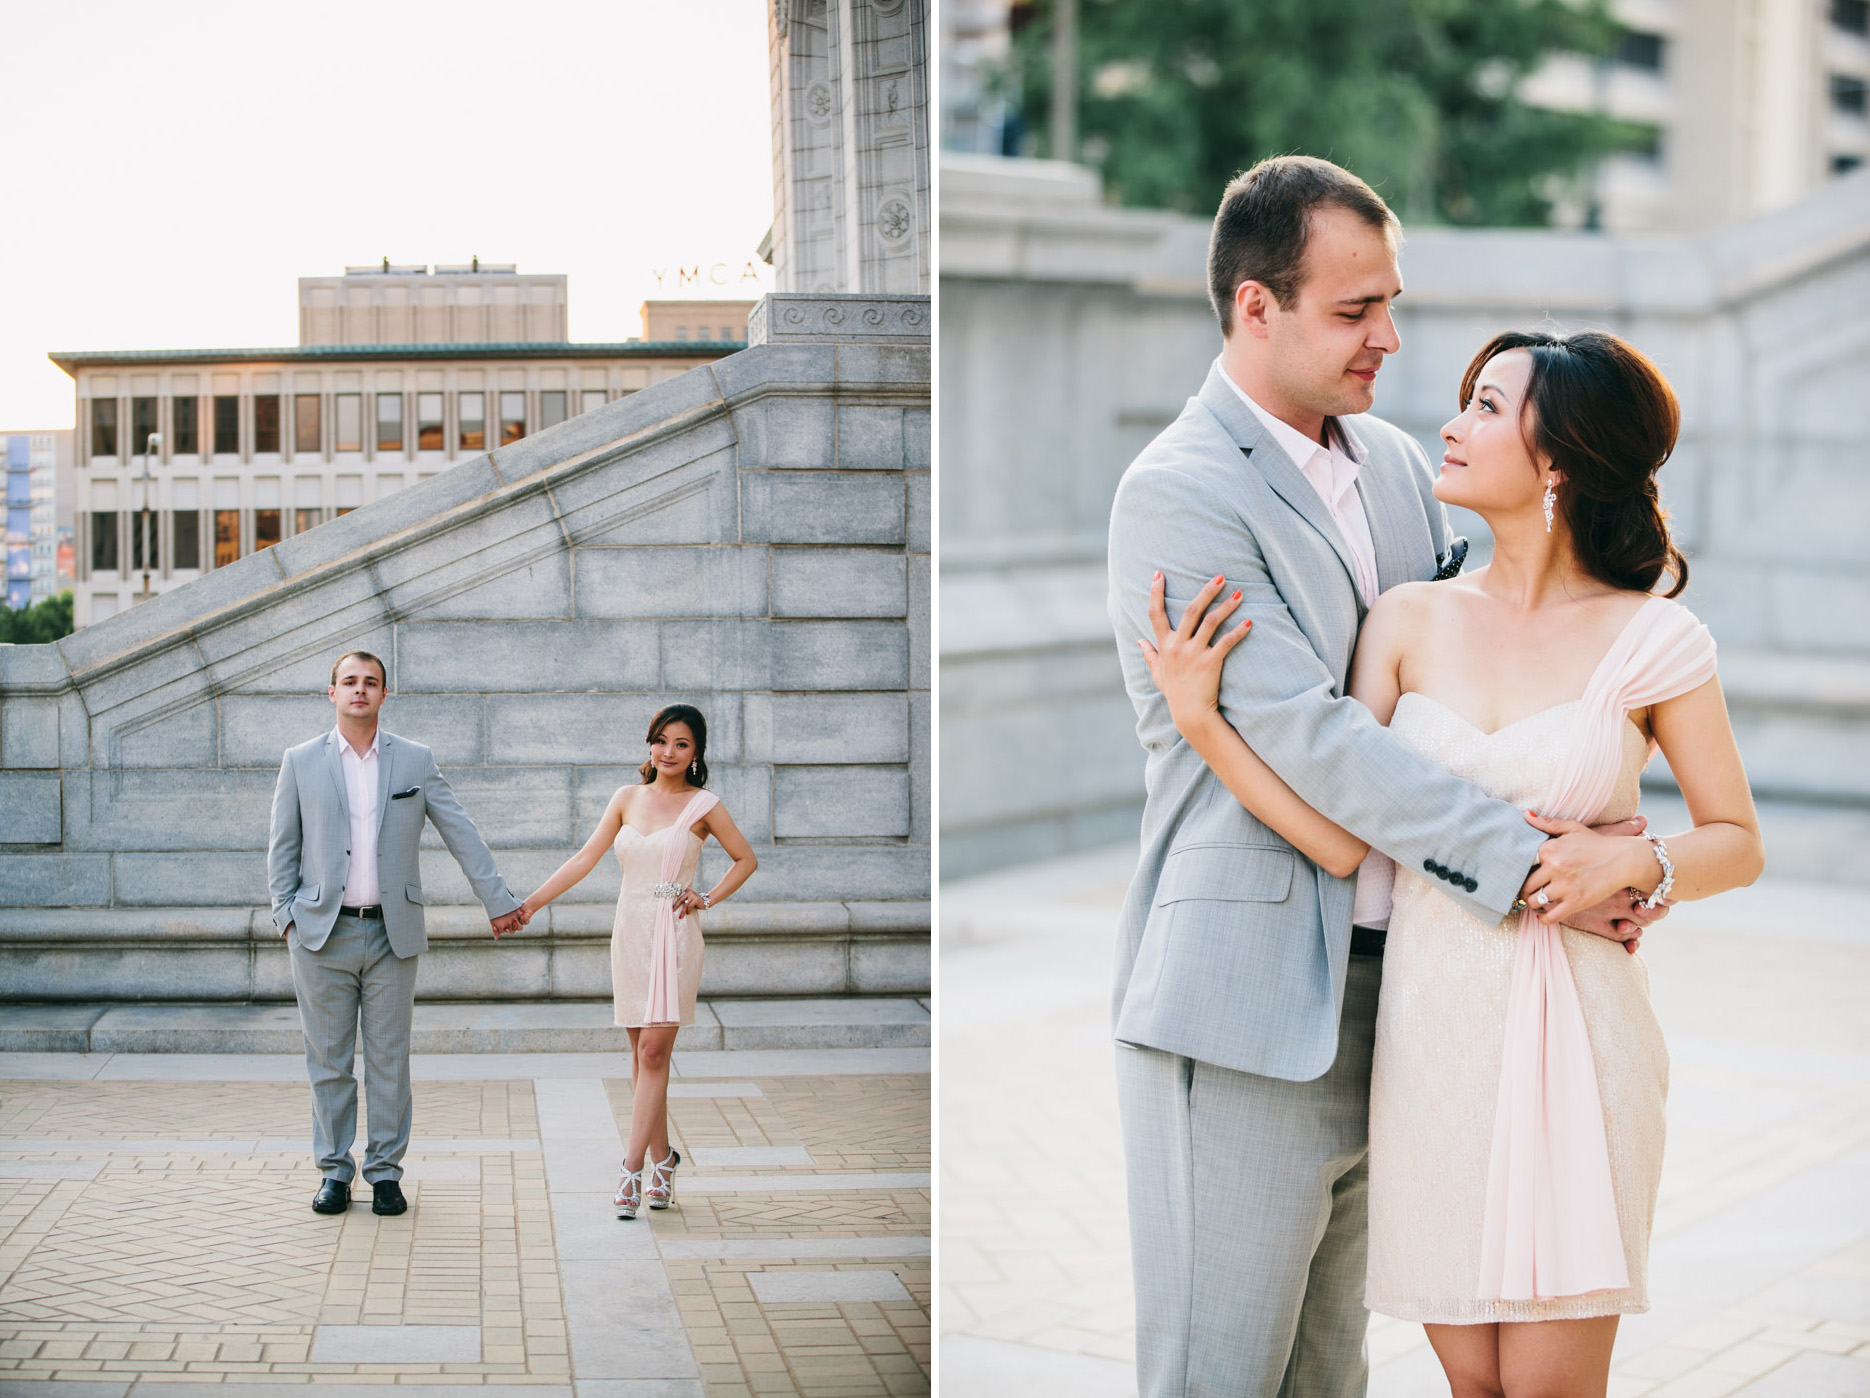 St-Louis-Wedding-Photography-1016-copy.jpg